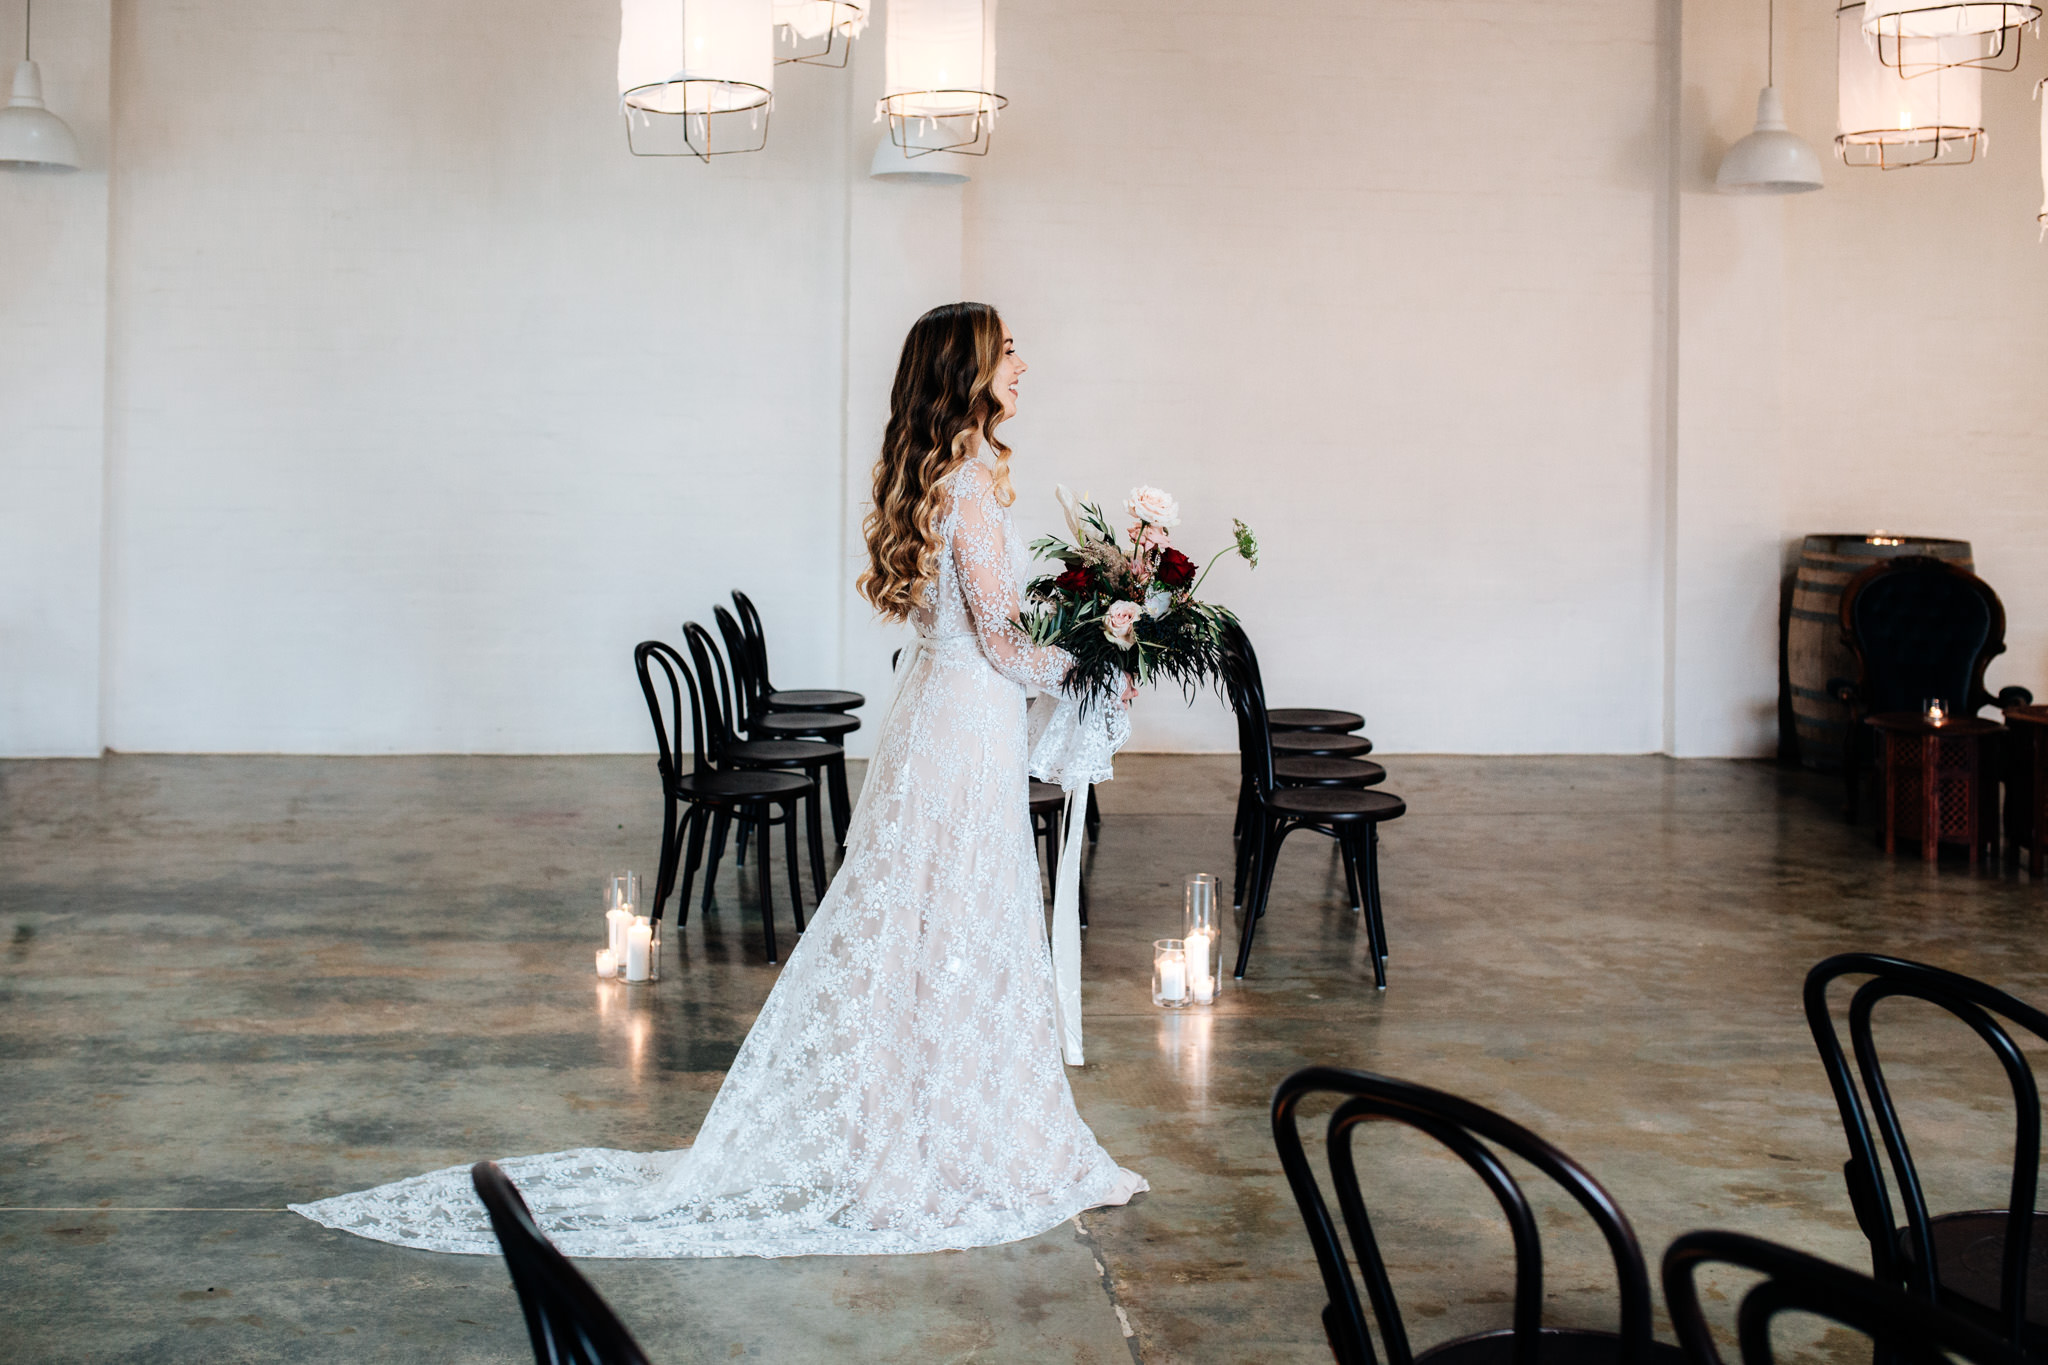 Aster and Rose - Wedding Planner and Co-ordinator - Torquay, Geelong, Surfcoast - Summer Wedding-76.jpg